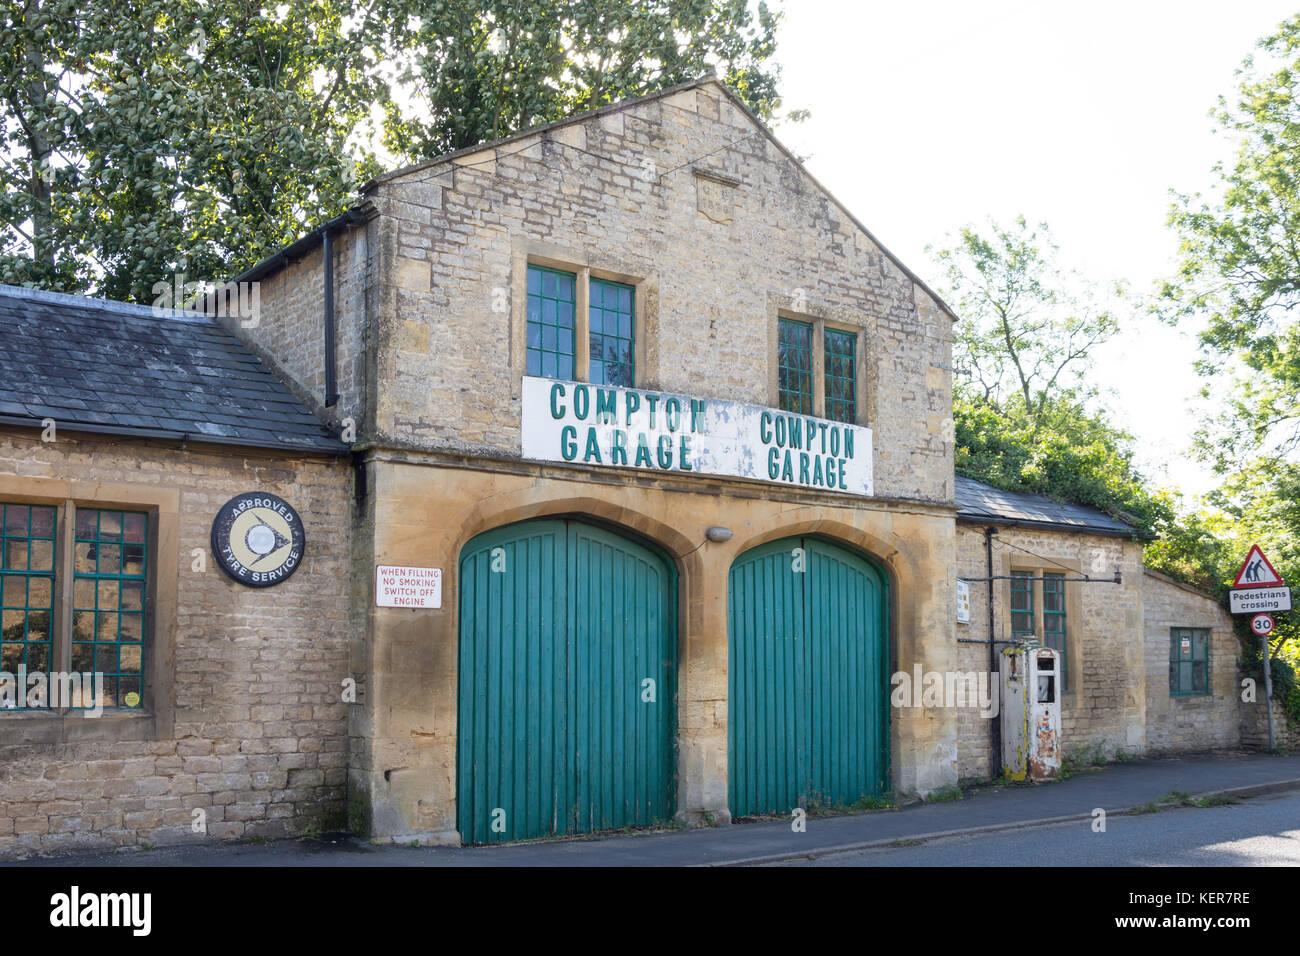 Old-fashioned garage frontage, Main Street, Long Compton, Warwickshire, England, United Kingdom - Stock Image